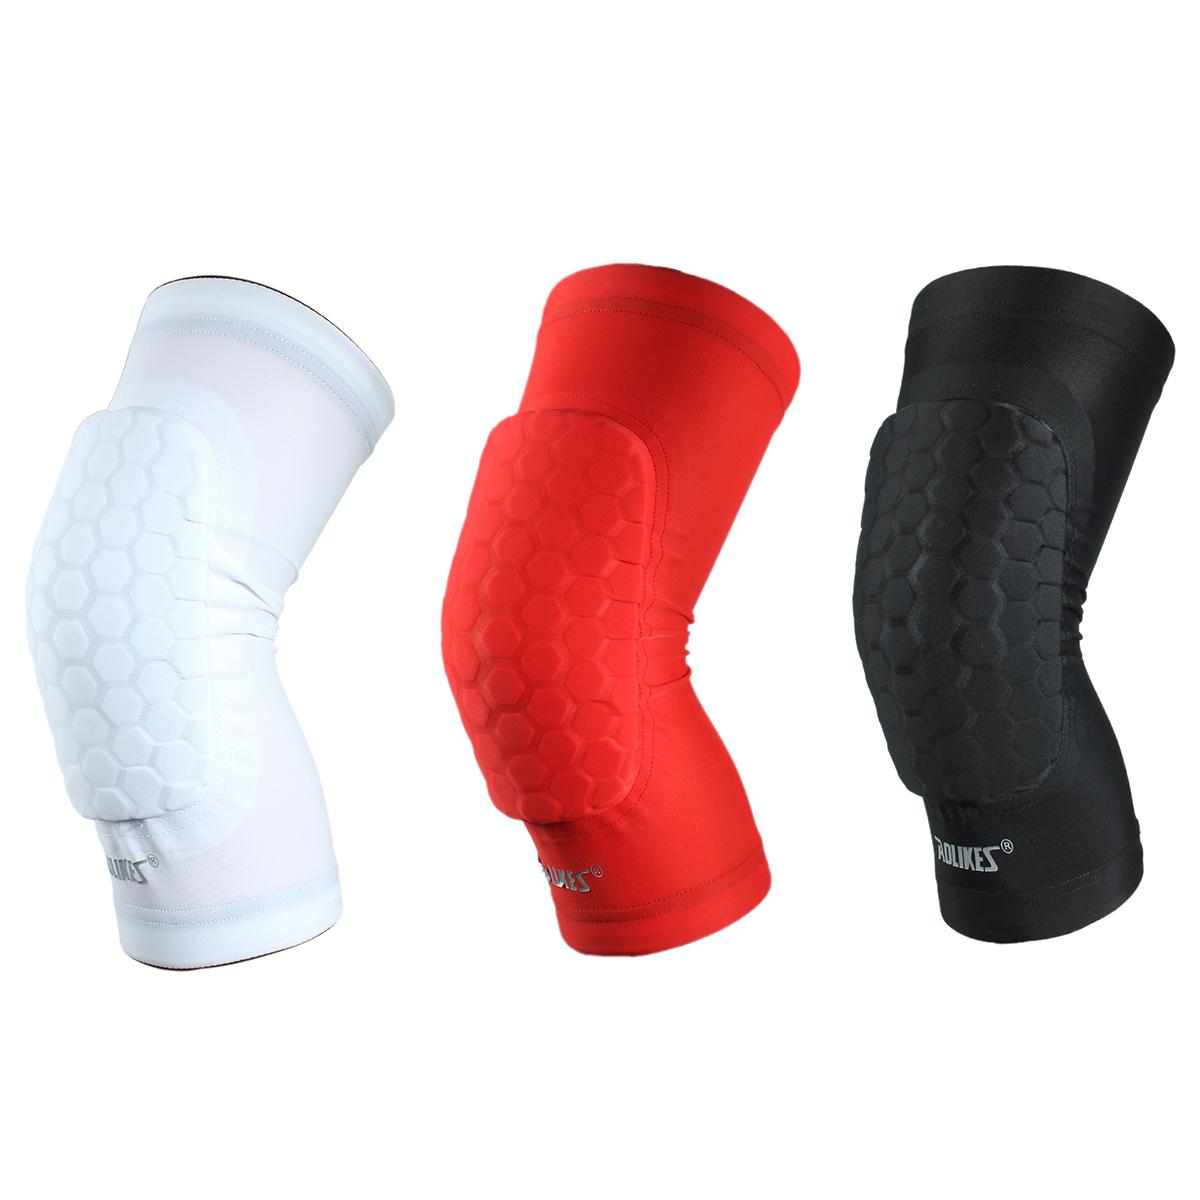 AOLIKES Hex Sponge Protective Knee Pads Basketball Leg